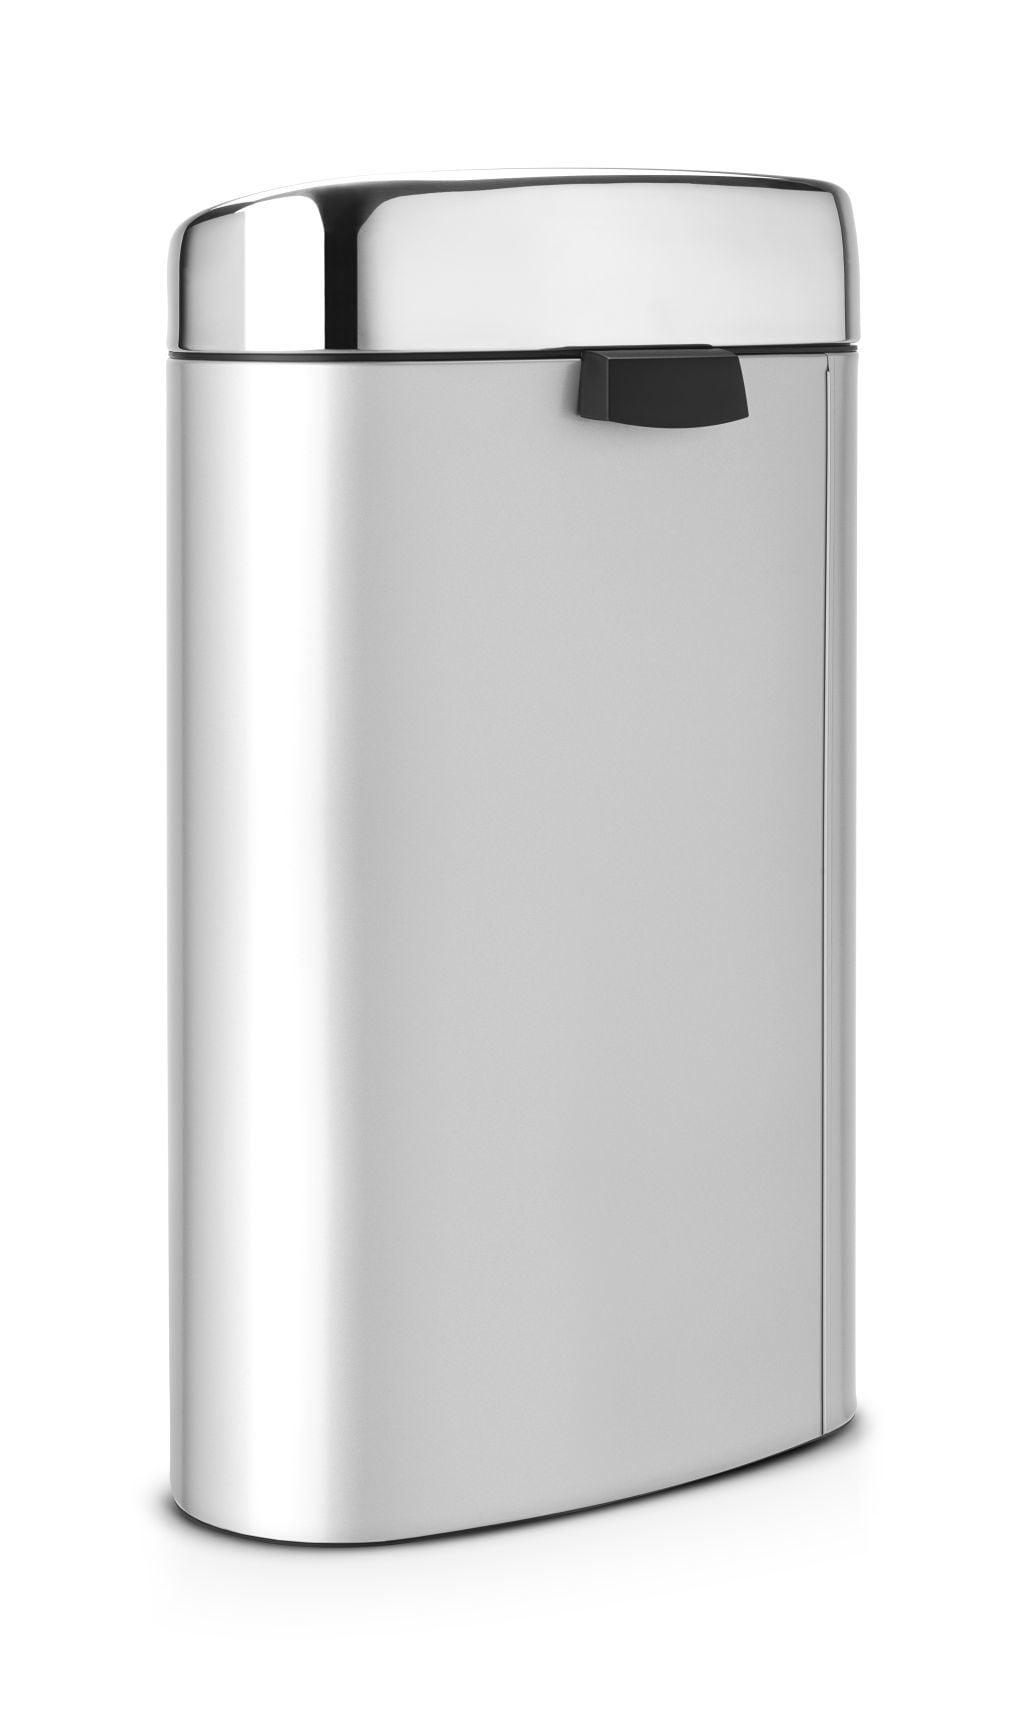 Brabantia Prullenbak 40 Liter.Brabantia Touch Bin 40 Liter Metallic Grey Brilliant Steel Deksel Brabantia Touch Bin 40 Liter Metallic Grey Brilliant Steel Deksel